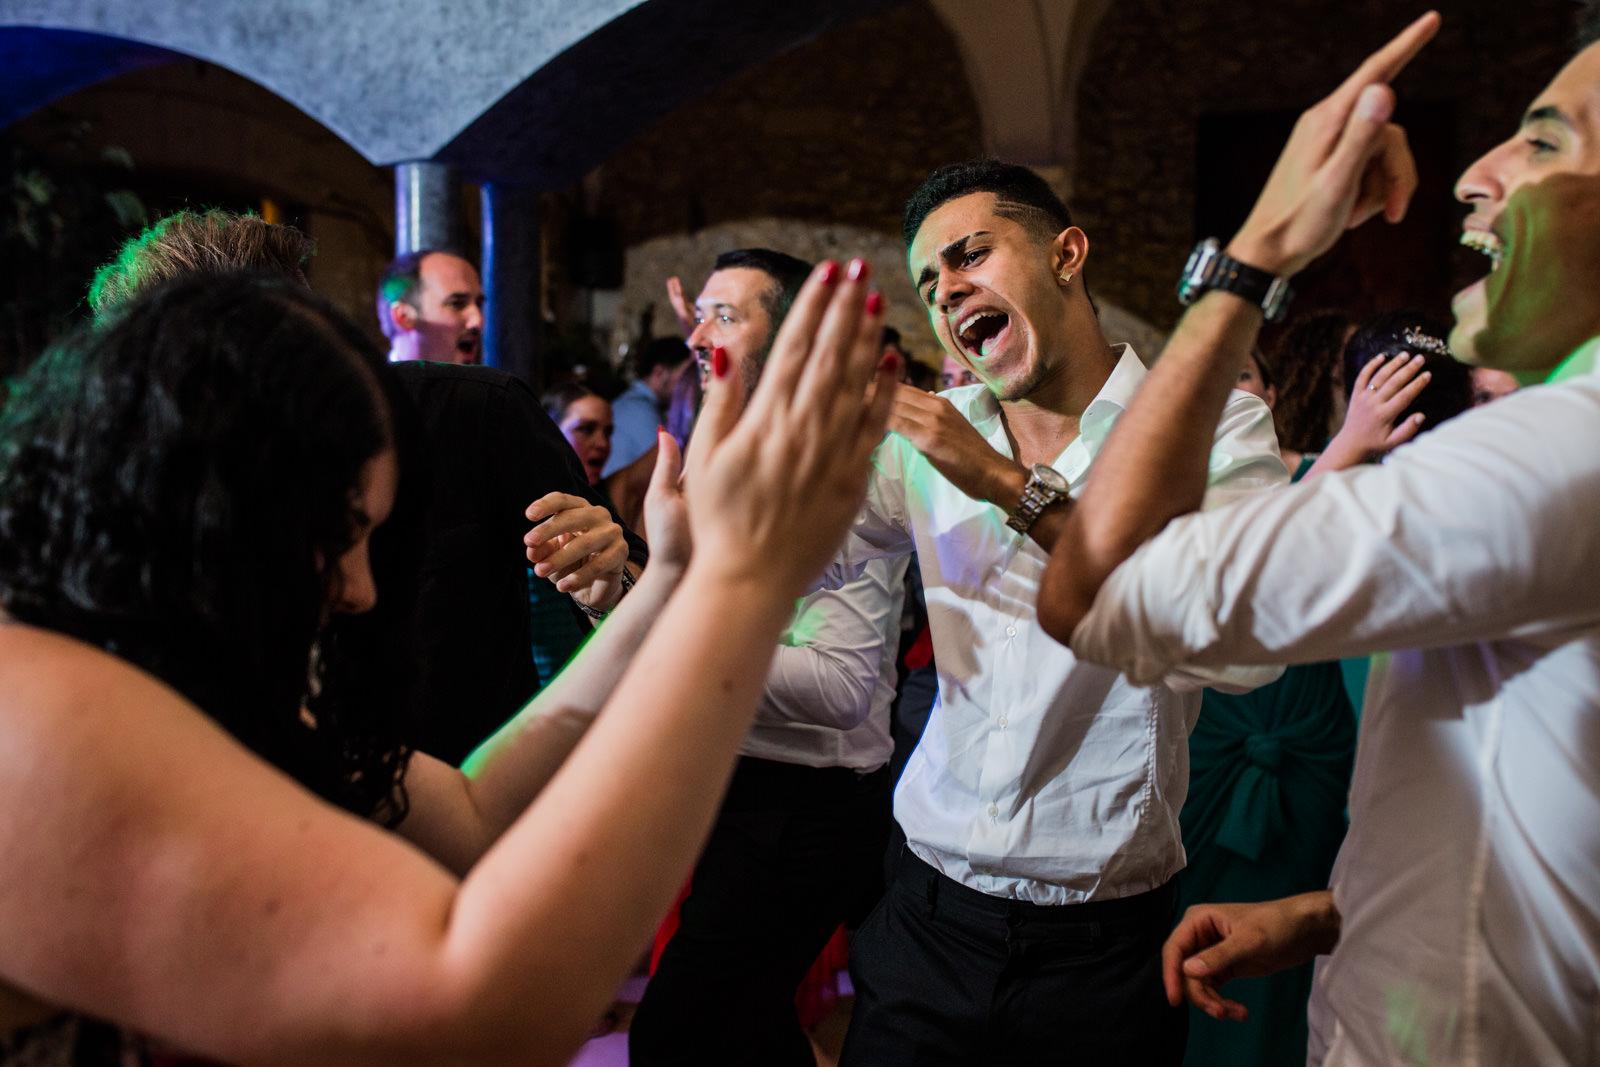 Almirall-Font-sitges-marbella-engagement-Rafael-Torres-fotografo-bodas-sevilla-madrid-barcelona-wedding-photographer--86.jpg